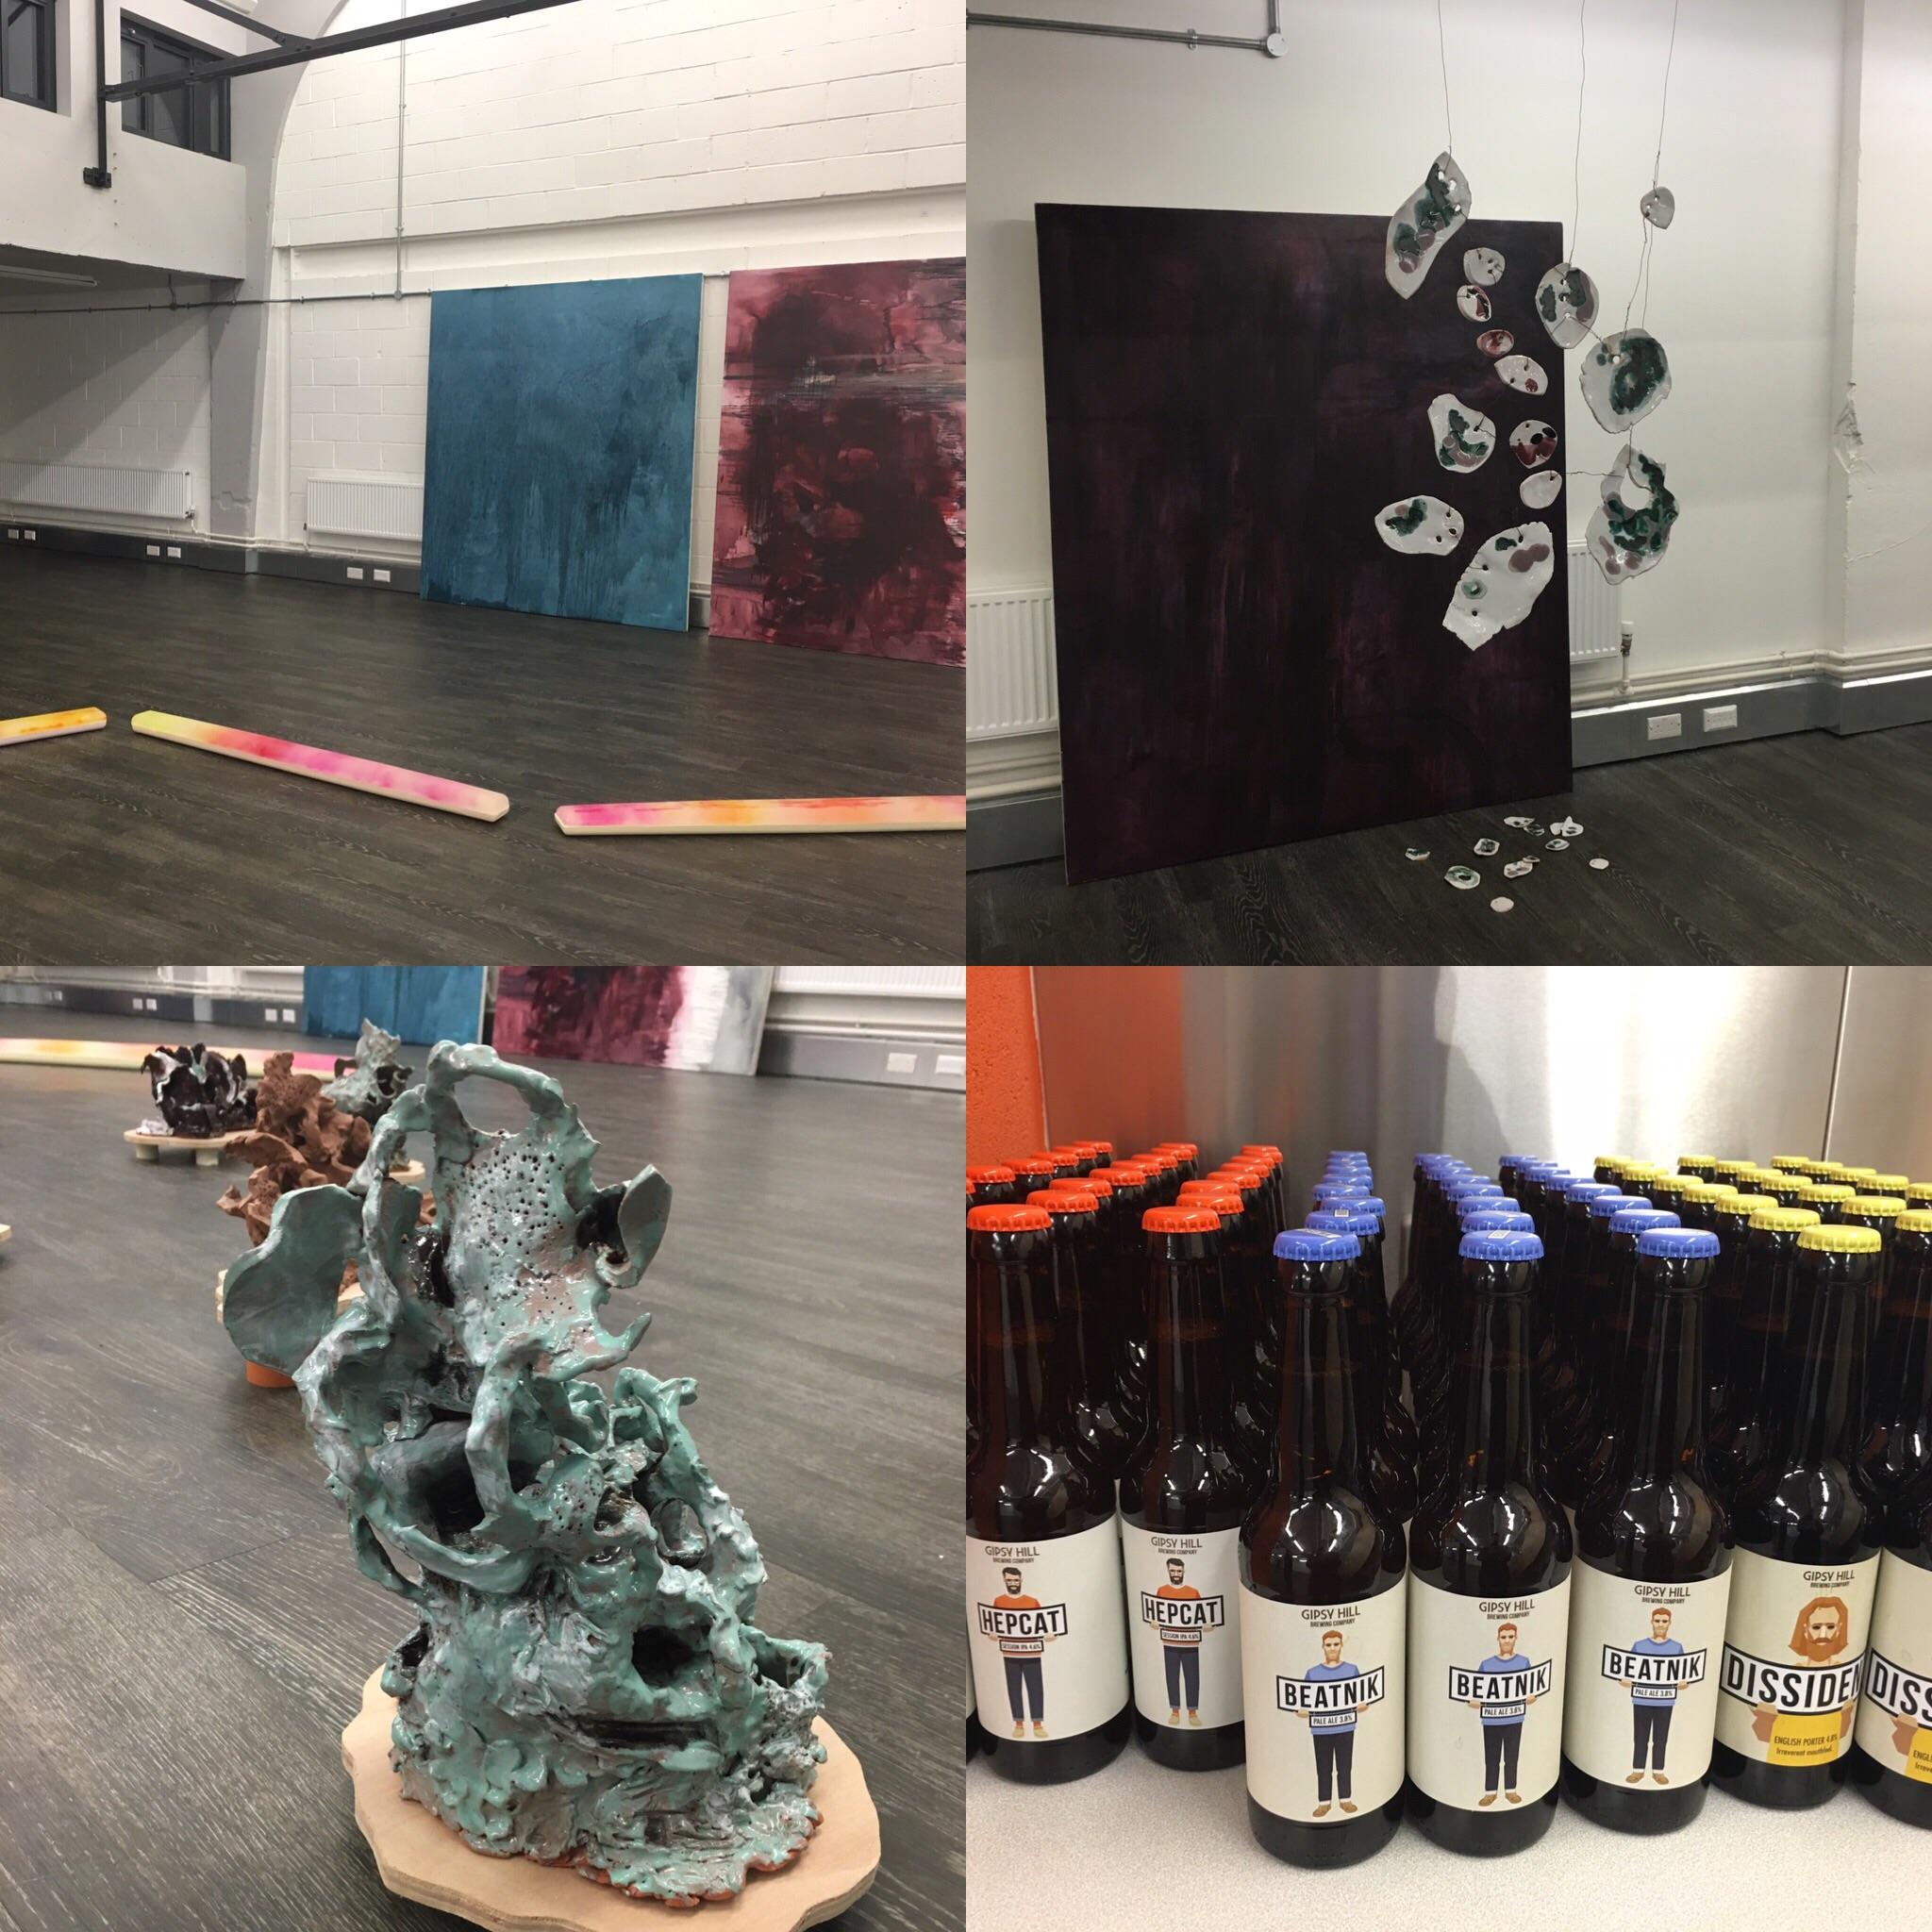 Art Exhibition at Parkhall Business Centre